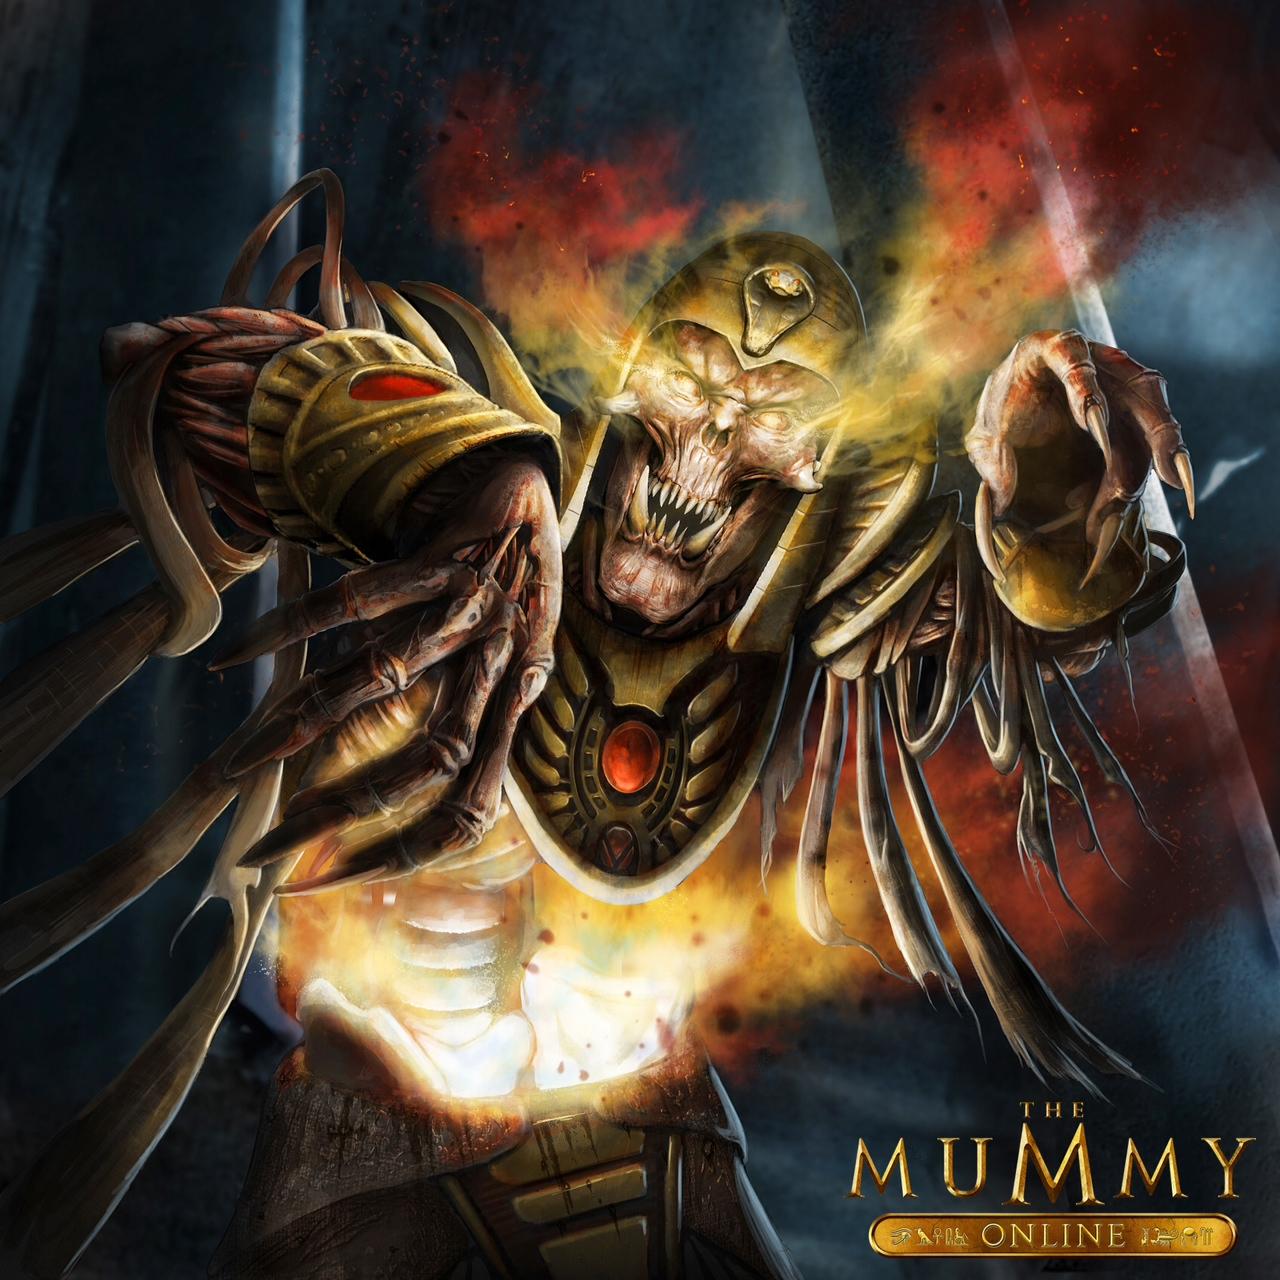 The Mummy Online